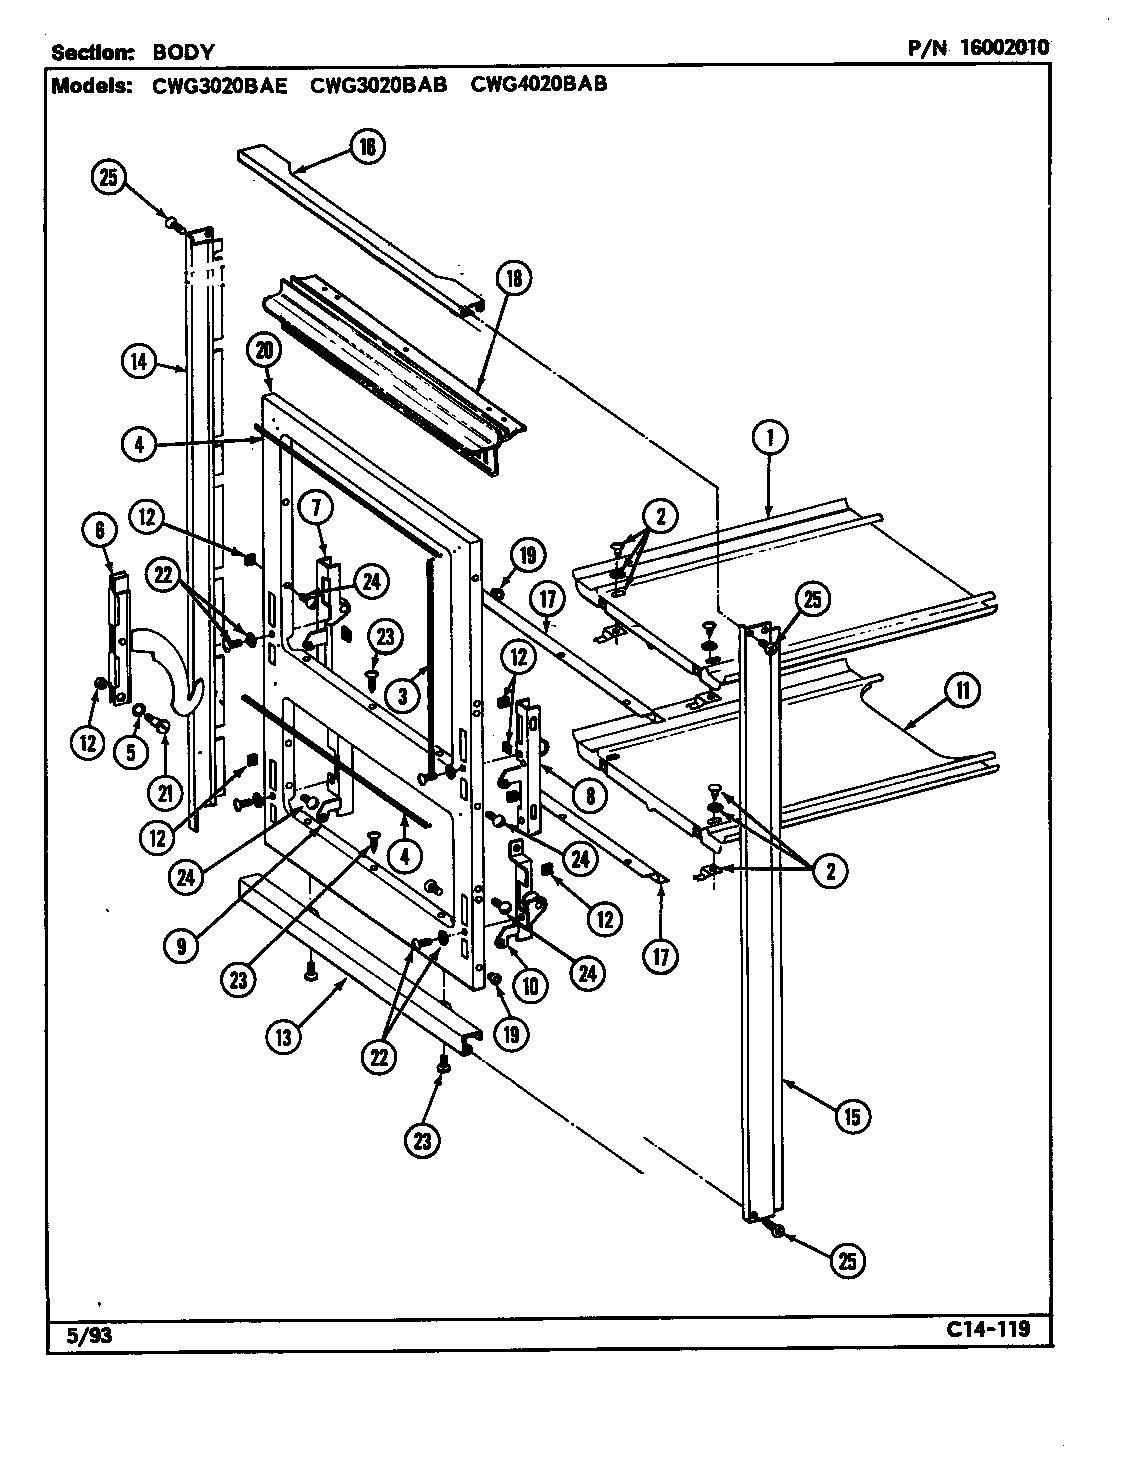 Maytag model CWG3020BAB wall oven, gas genuine parts